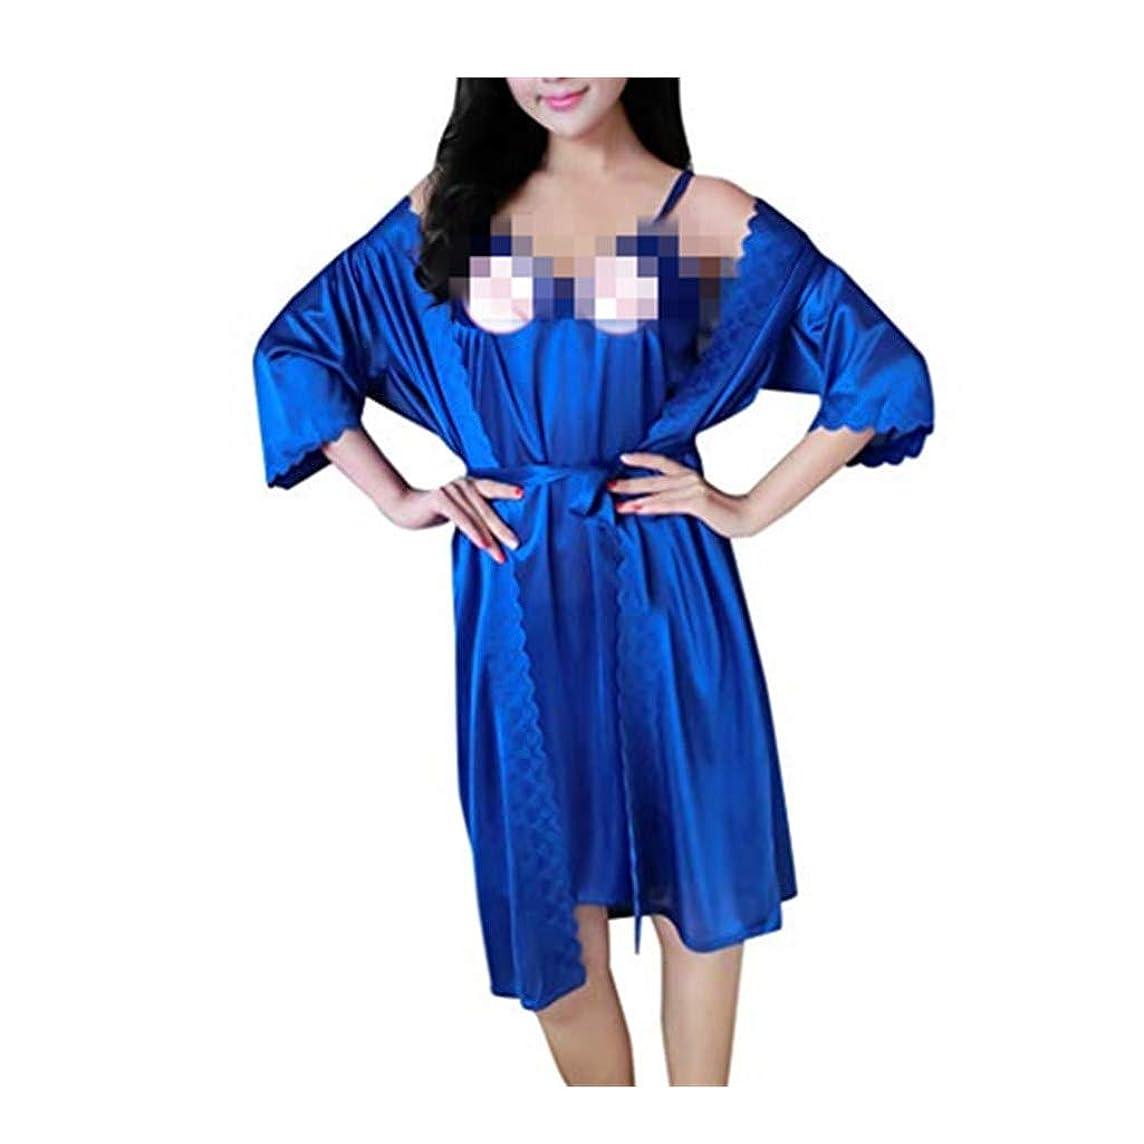 Fxbar Soft Womens Sexy Ice Silk Temptation Lingerie Sleepwear Gorgeous Robe Loungewear Sleep Shirt